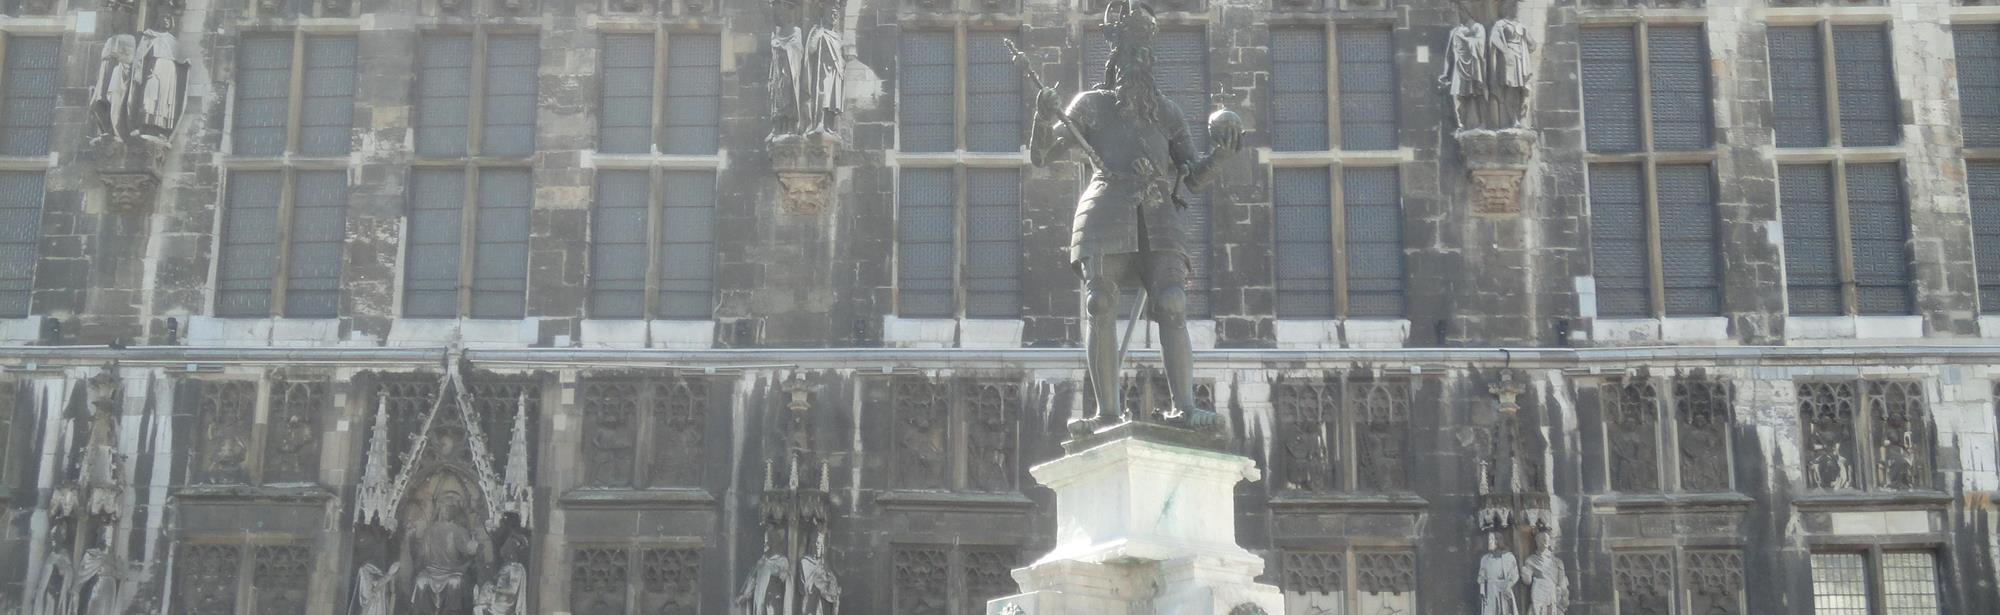 Standbeeld Karel de Grote